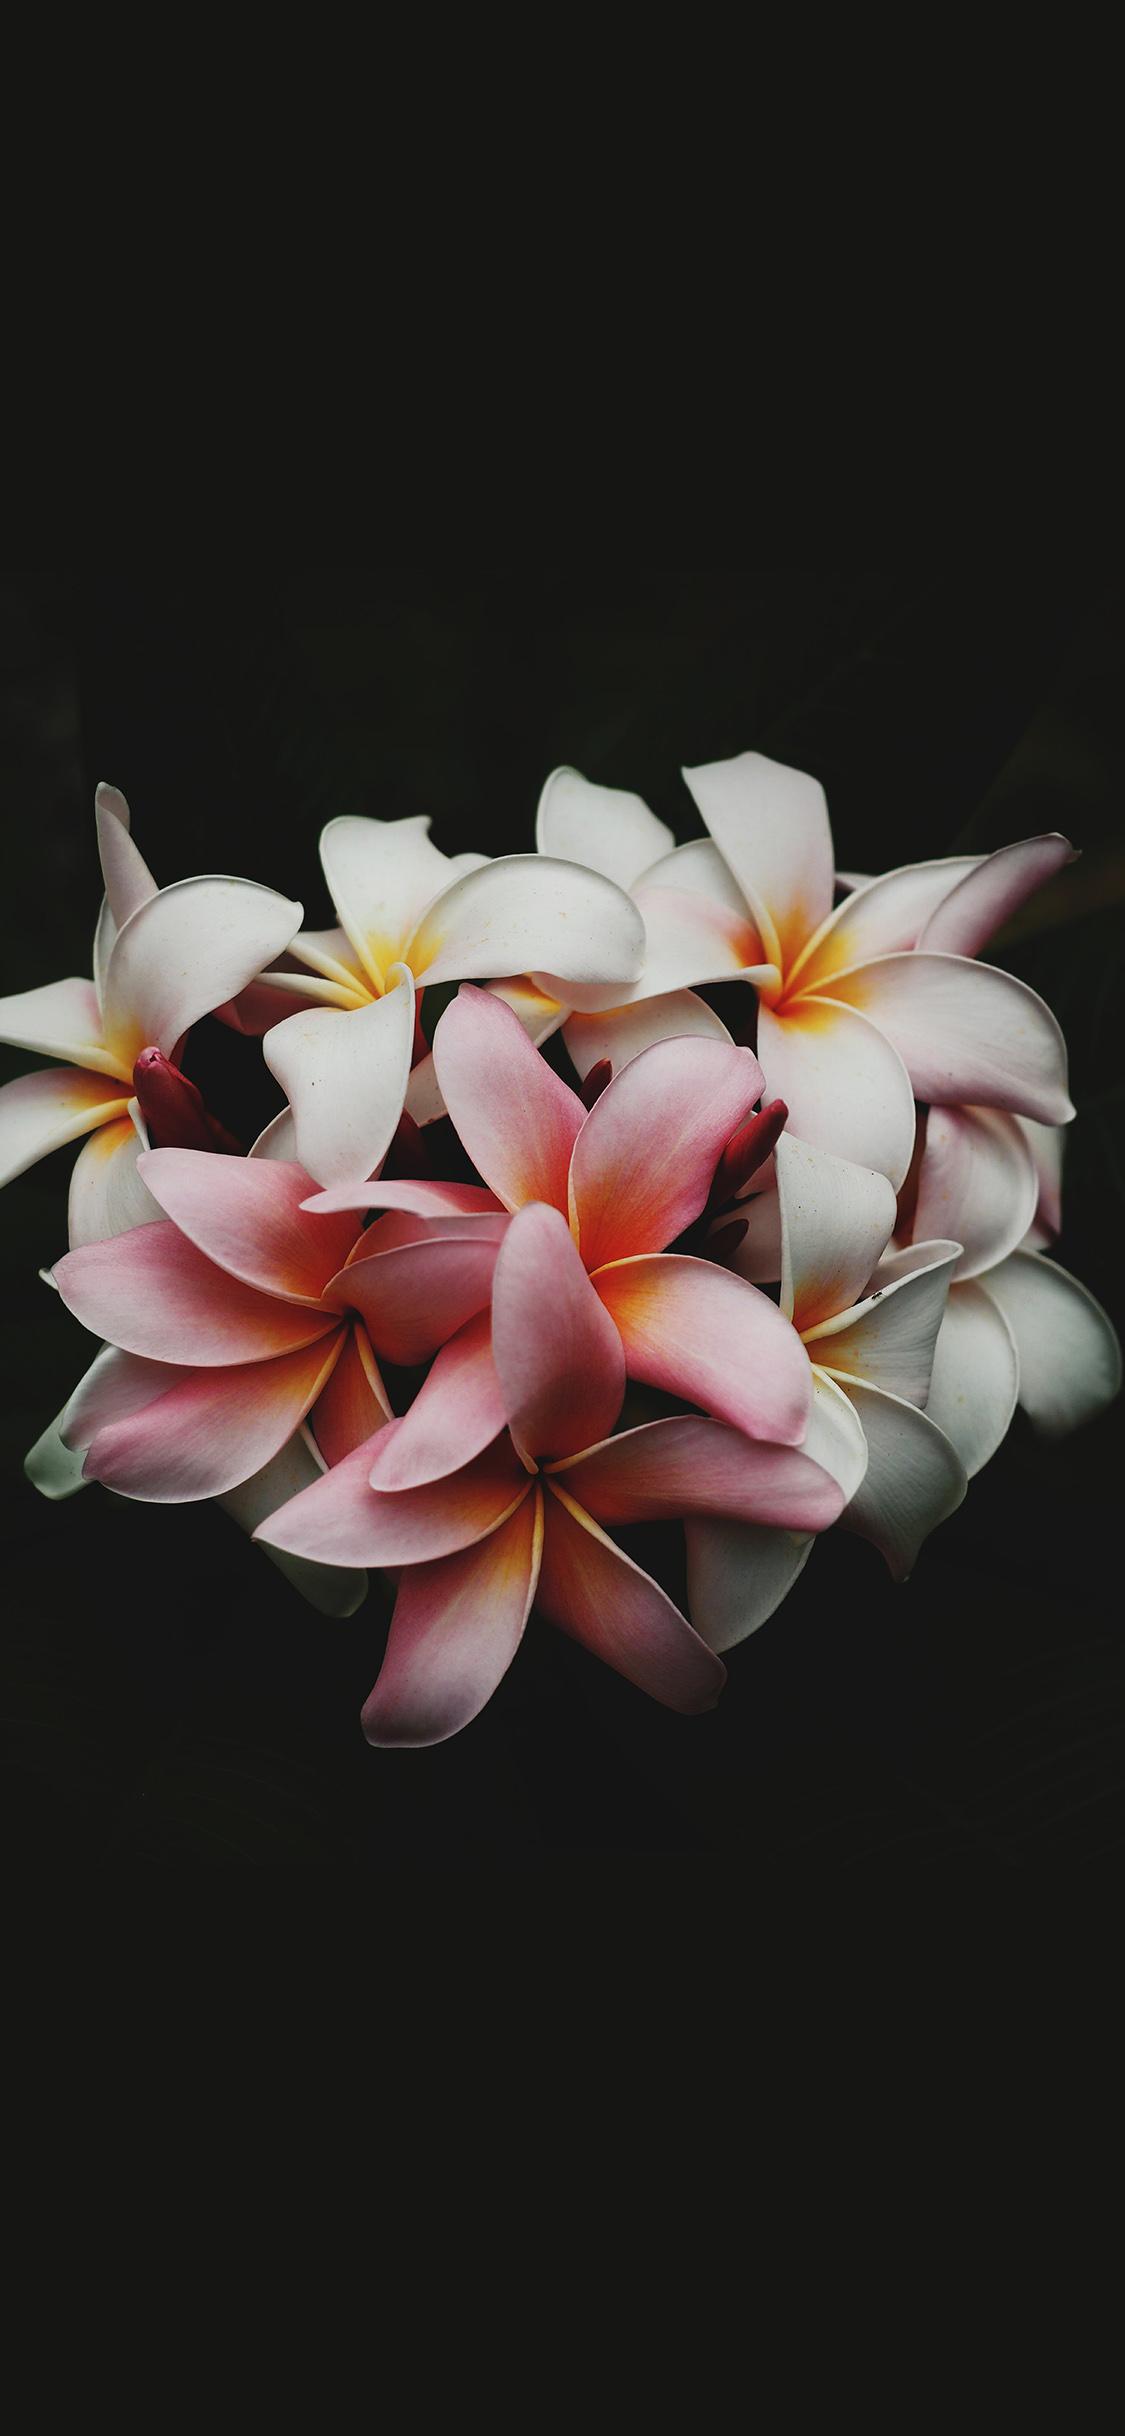 iPhoneXpapers.com-Apple-iPhone-wallpaper-nq75-flower-dark-nature